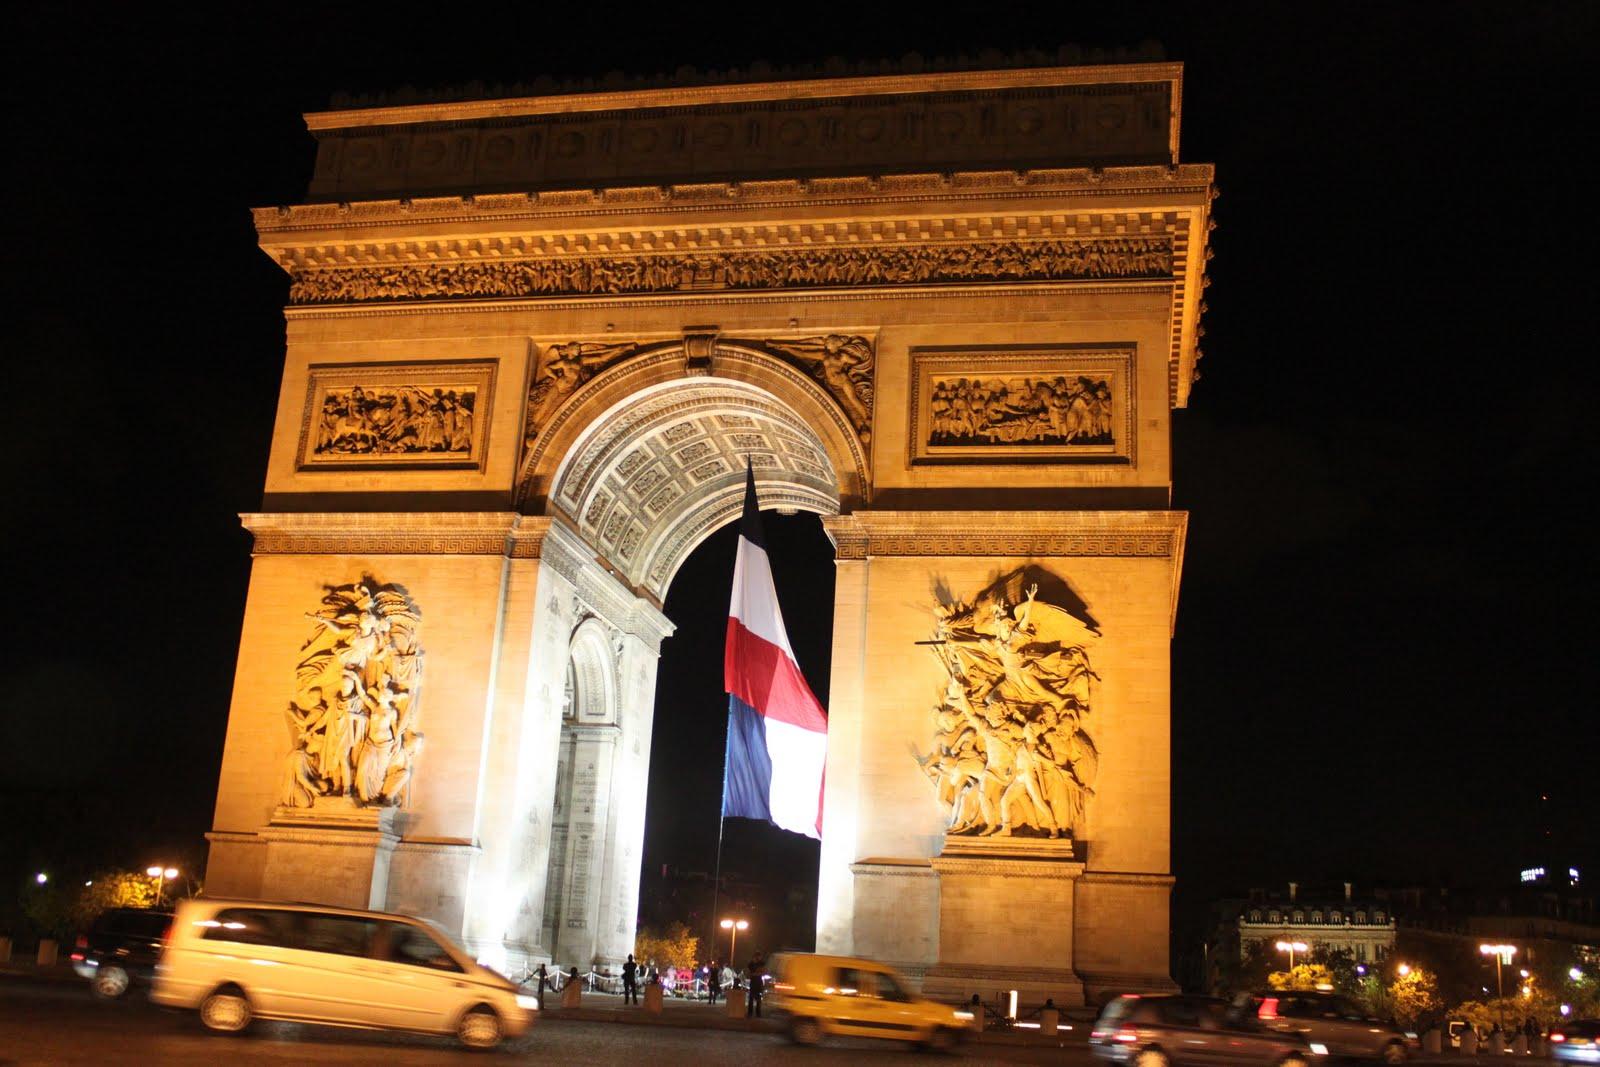 l arc de triomphe The arc de triomphe, a triumphal arch in paris commissioned by napoleon in 1806.